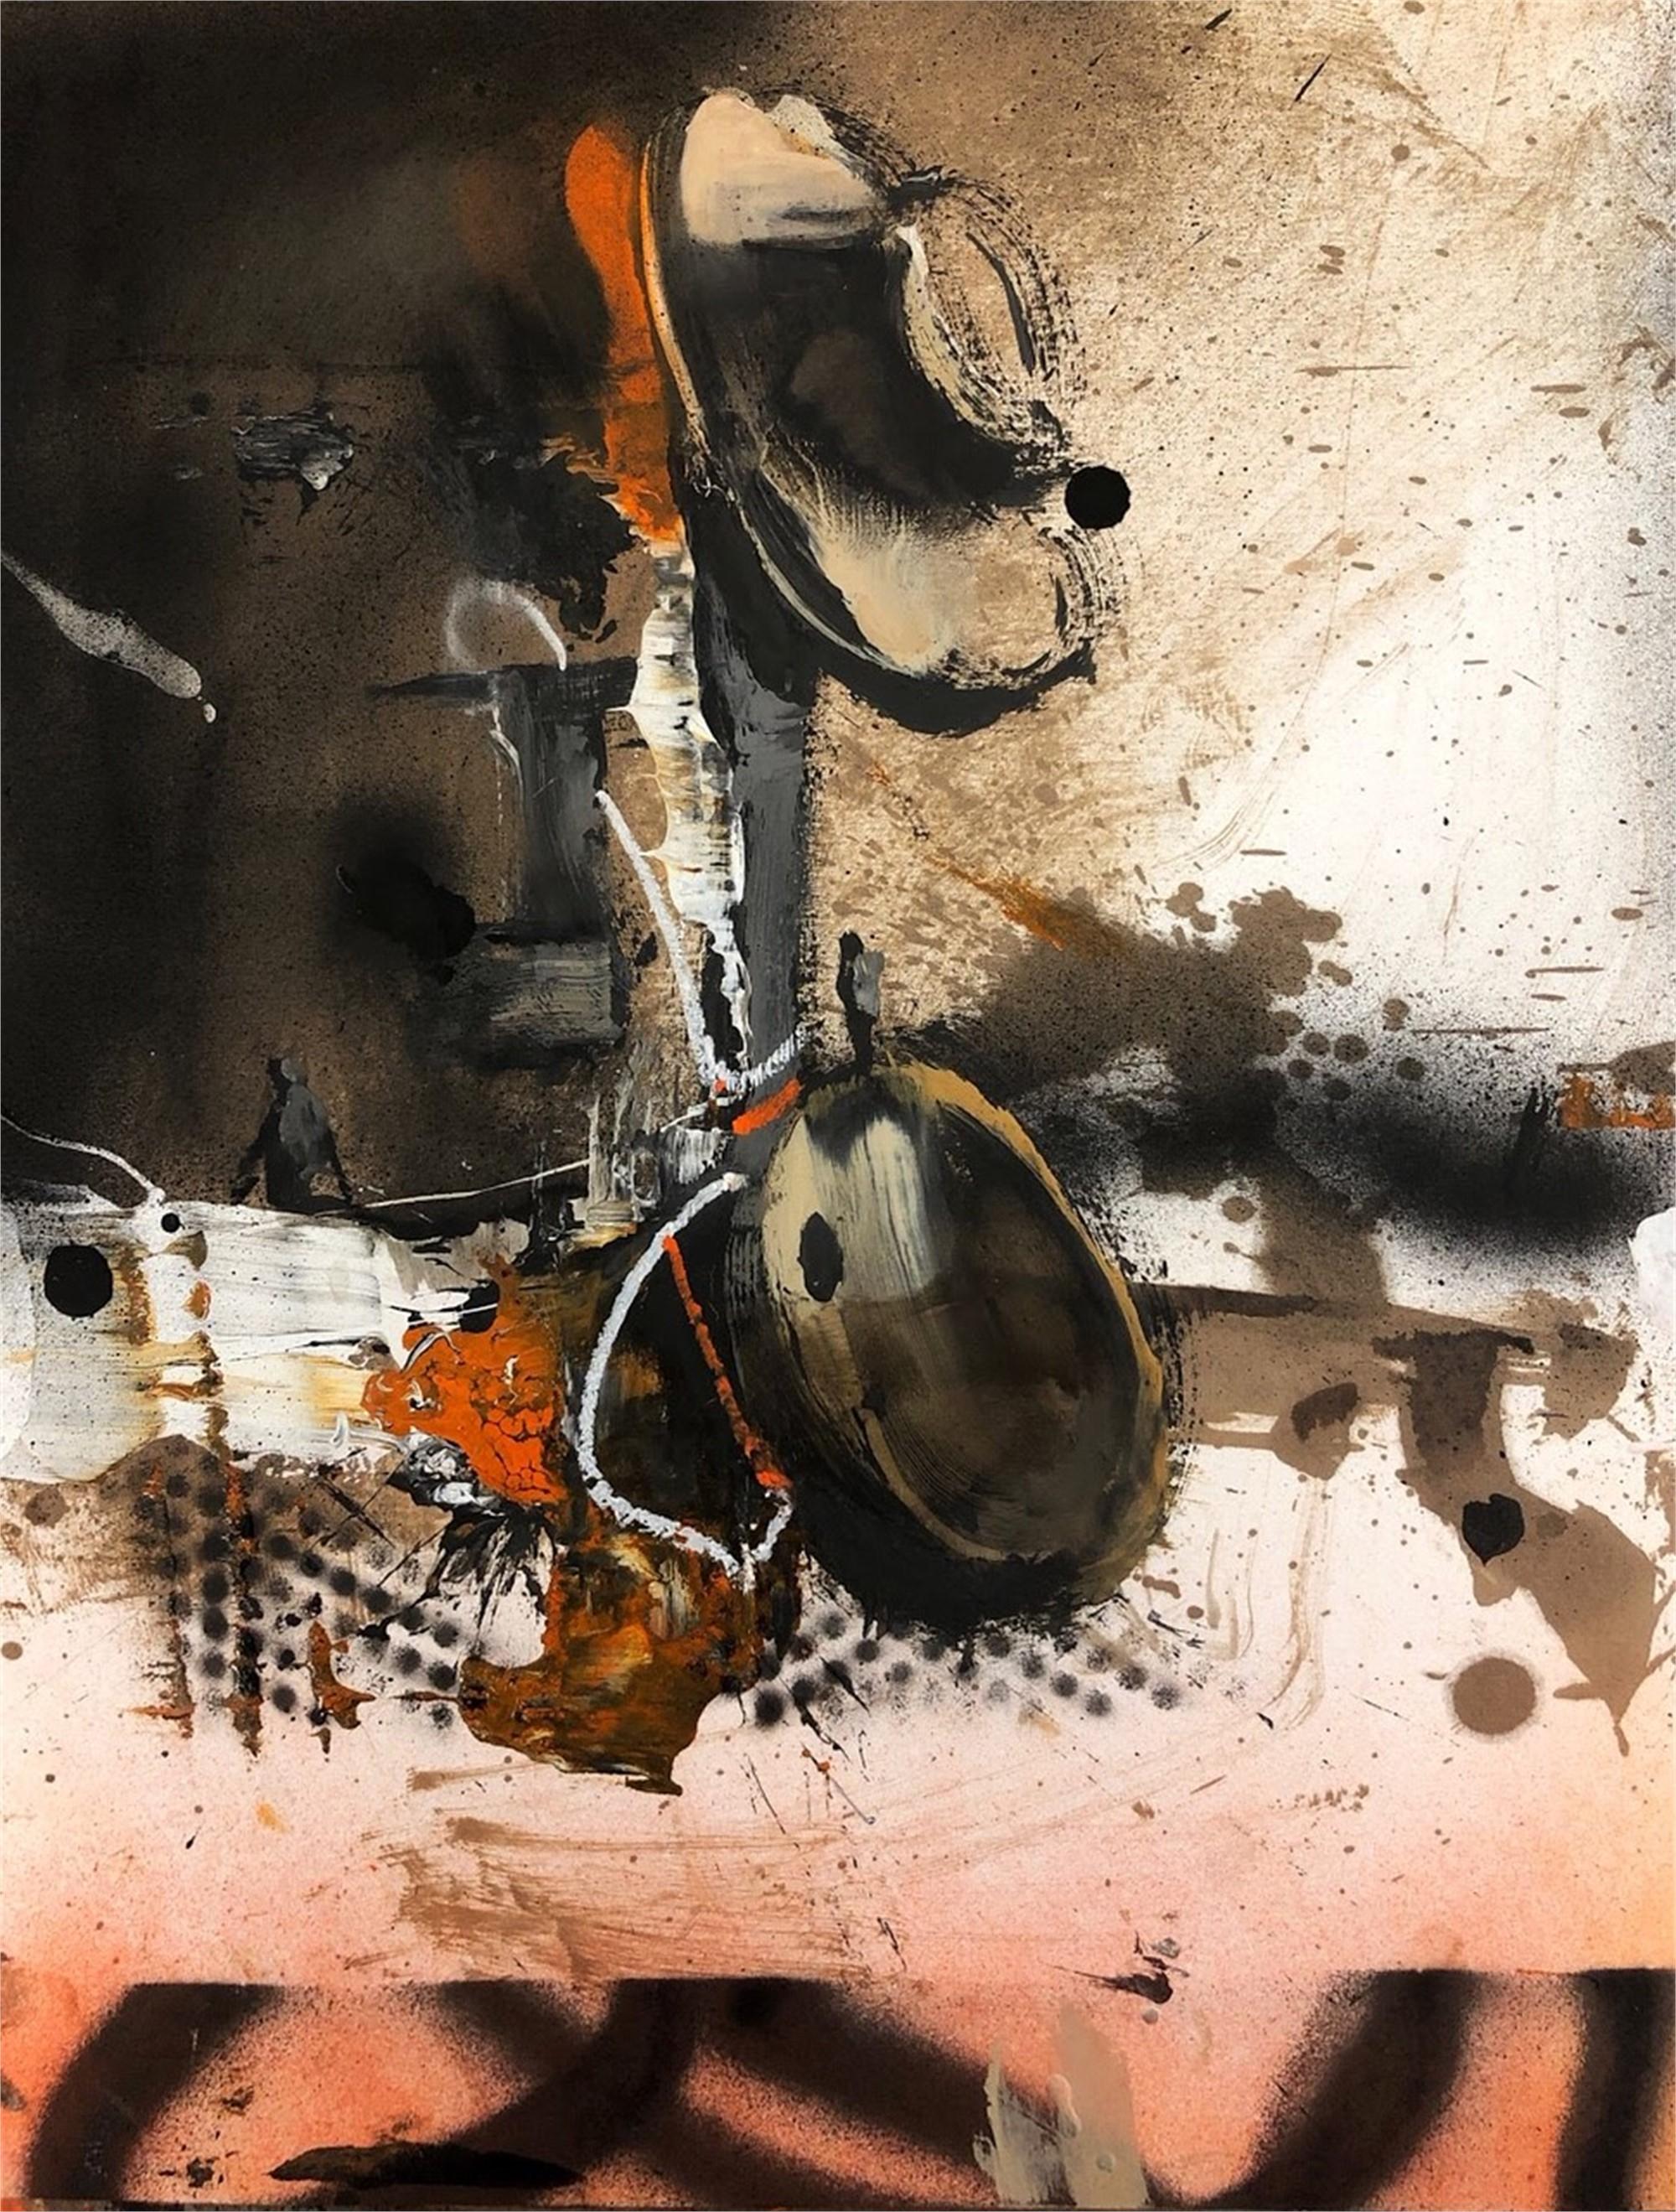 Orwellian 32 by Marcus Jansen